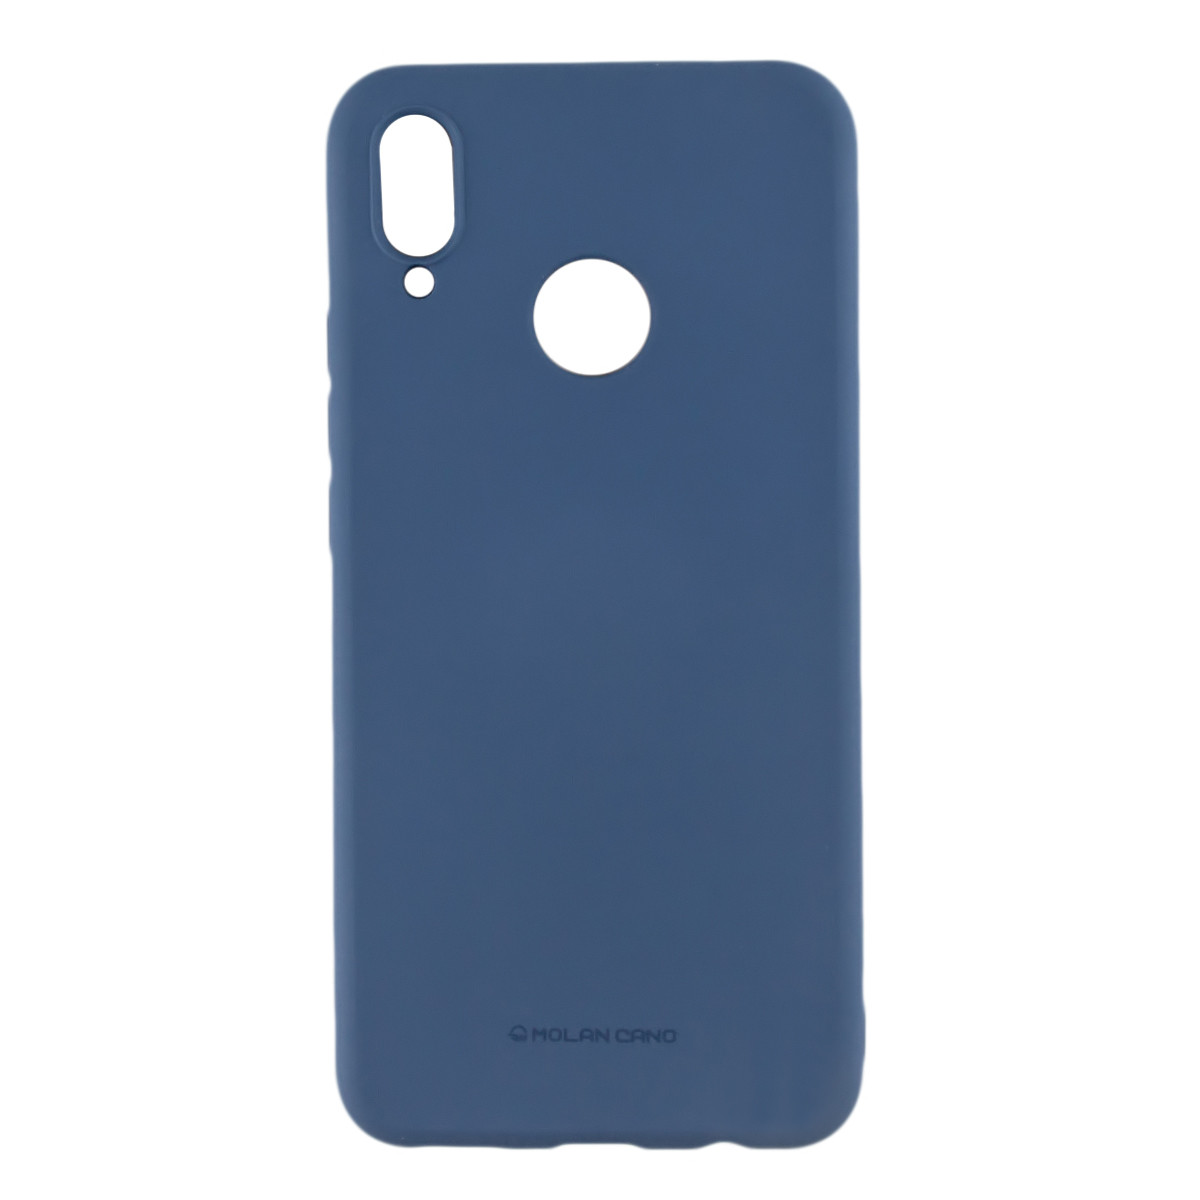 Силиконовый чехол накладка Molan Cano Jelly Case для Huawei P Smart Plus (INE-LX1) (blue)